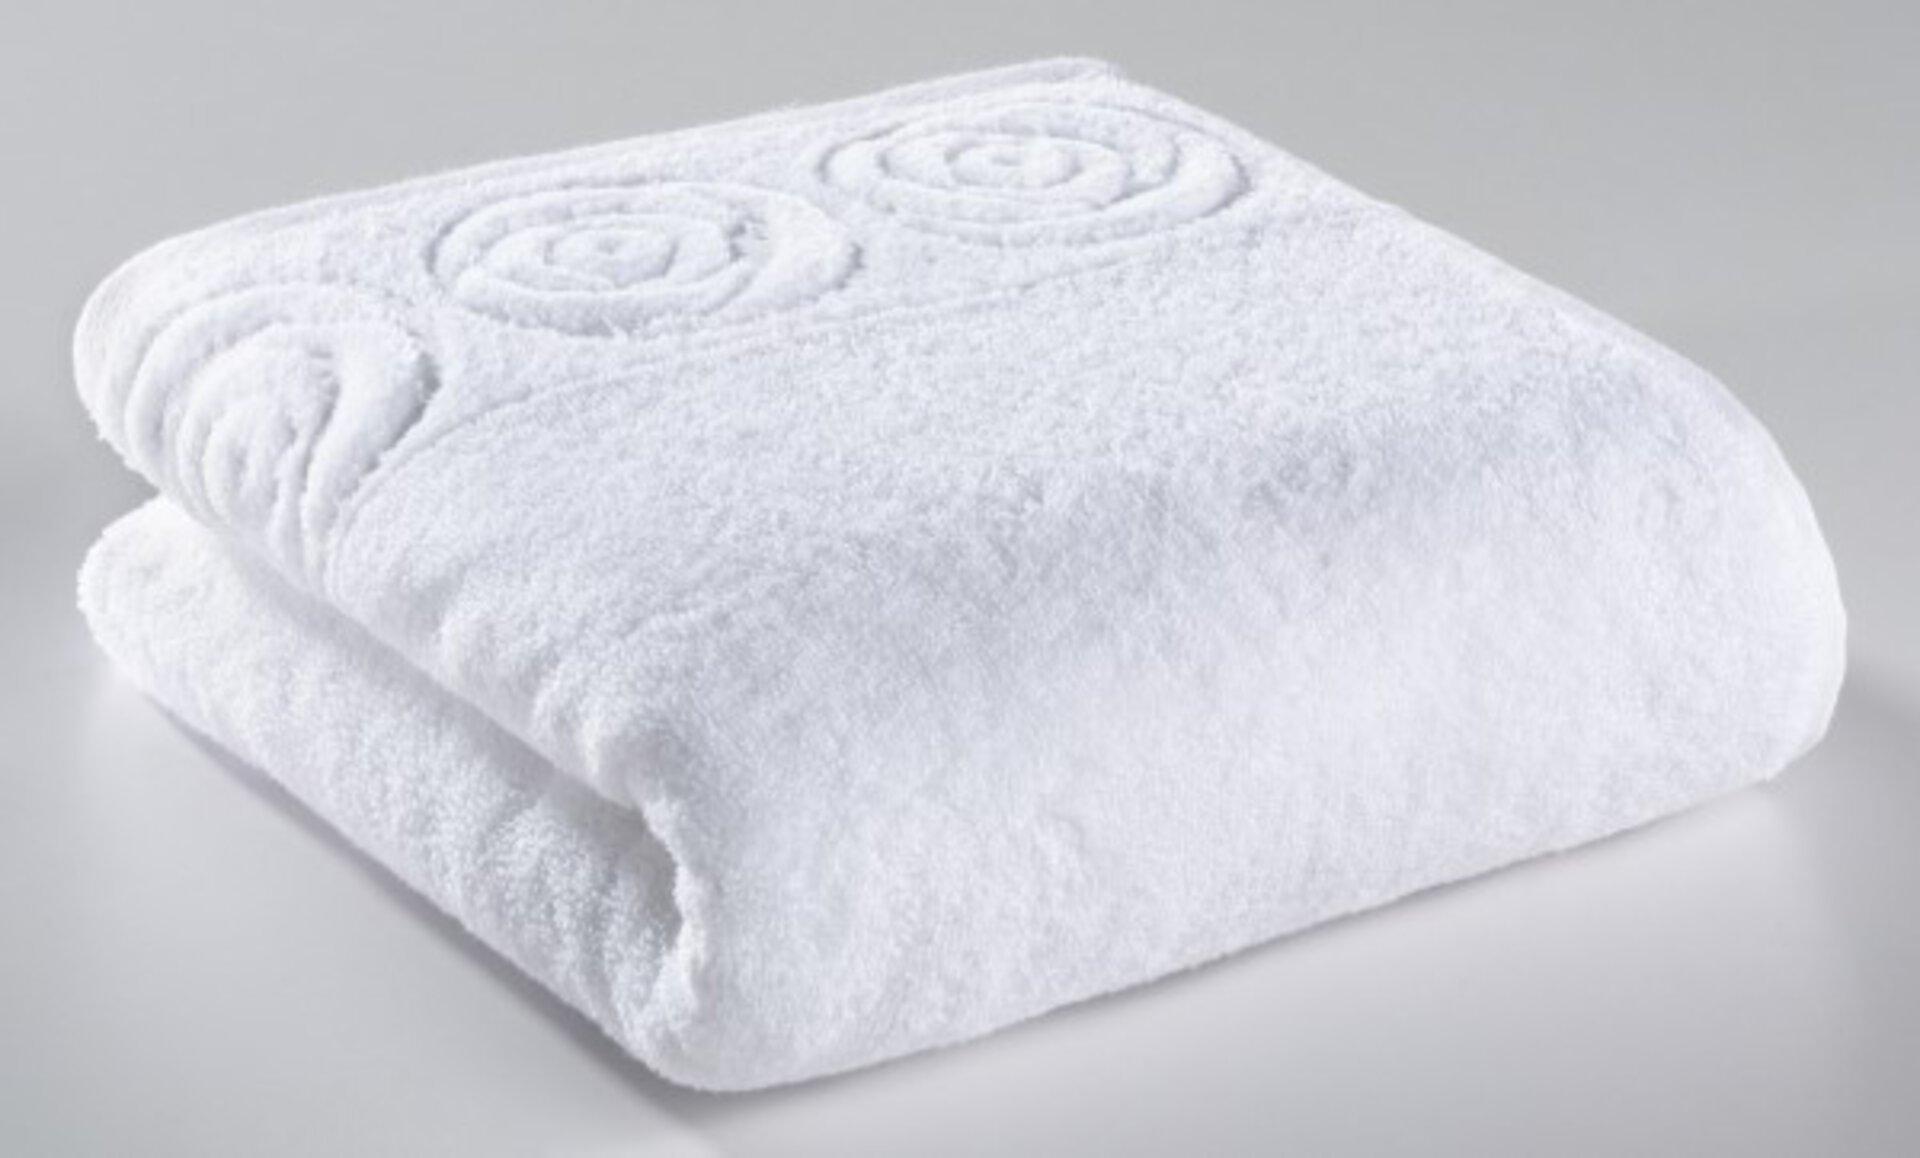 Duschtuch Rosenbordüre Casa Nova Textil weiß 70 x 140 cm